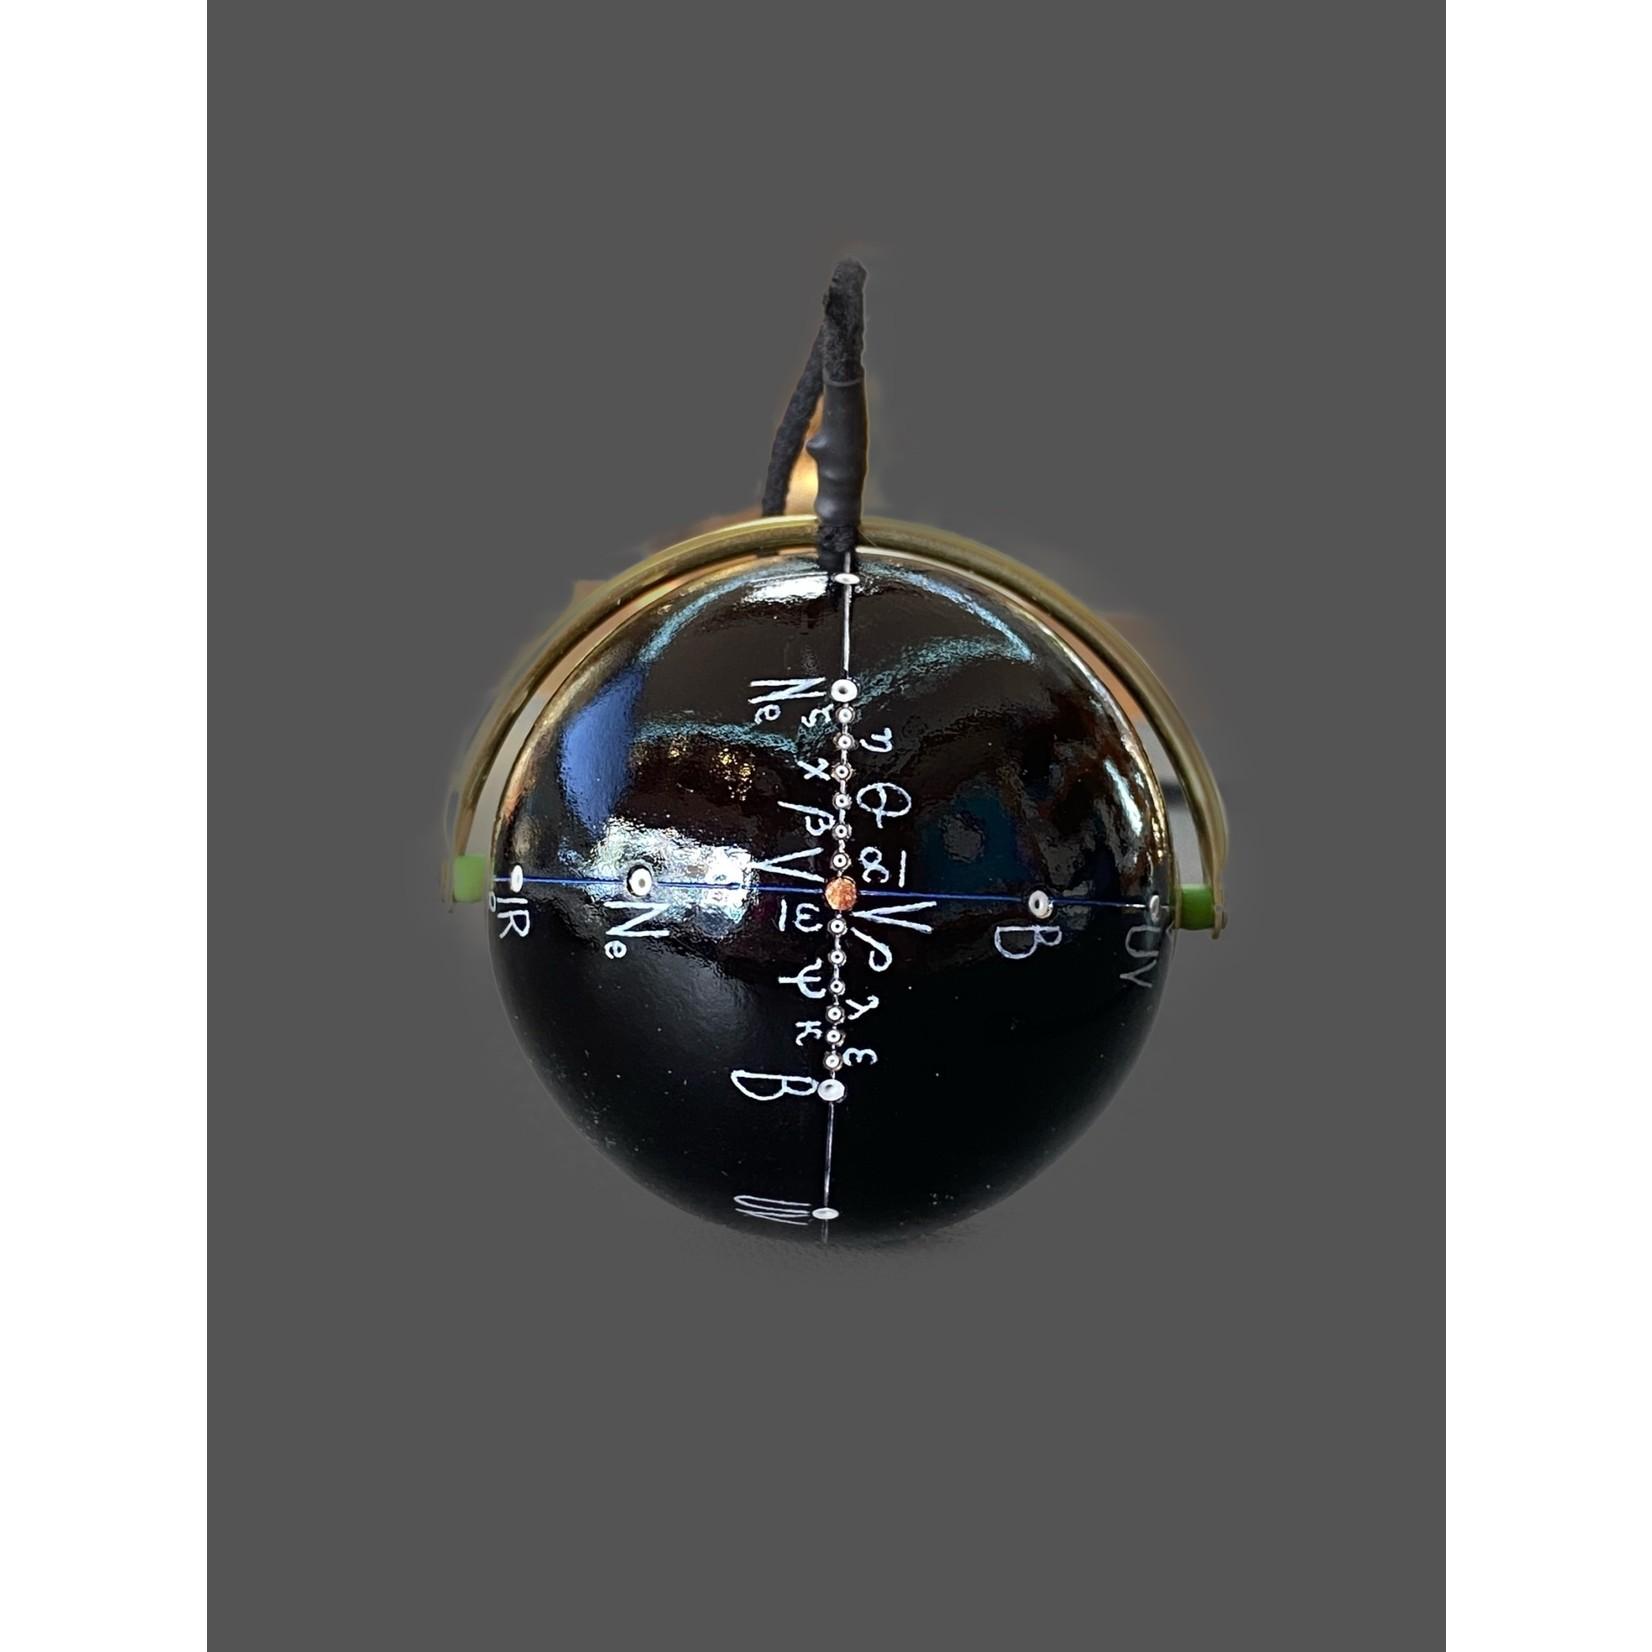 Péndulo Universal Madera pequeño 5,5 cm